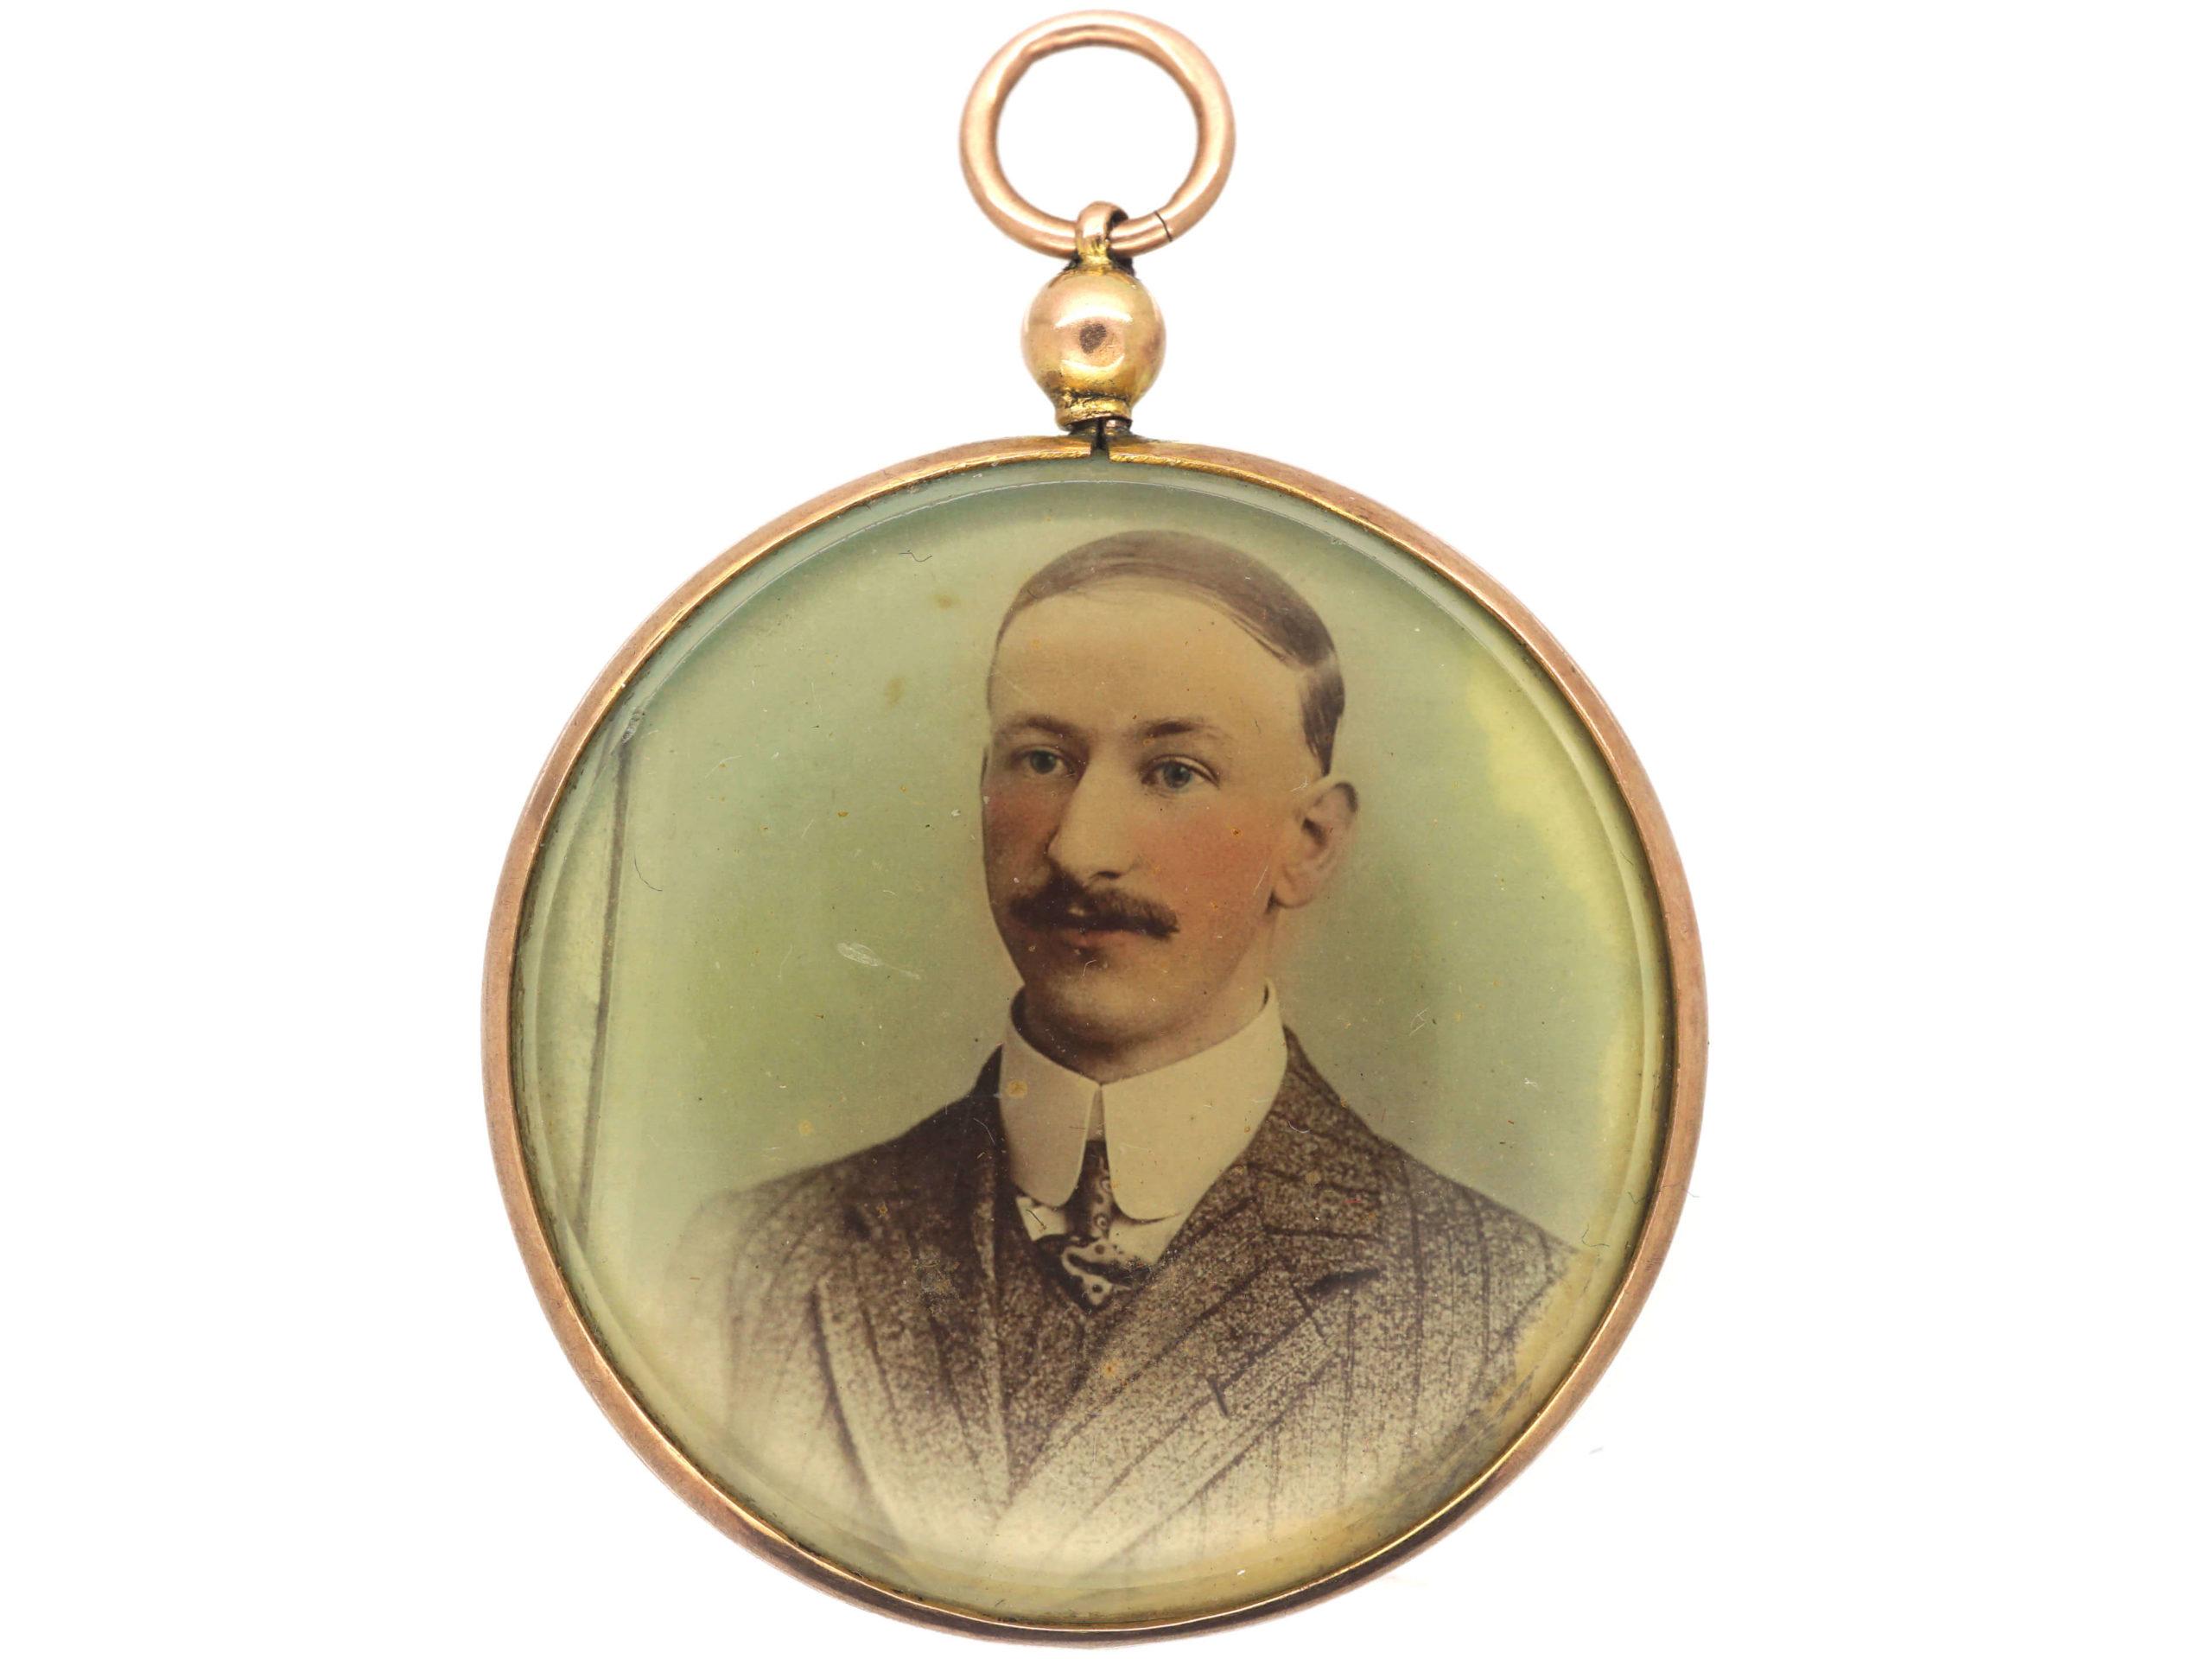 Edwardian 9ct Gold Round Picture Locket